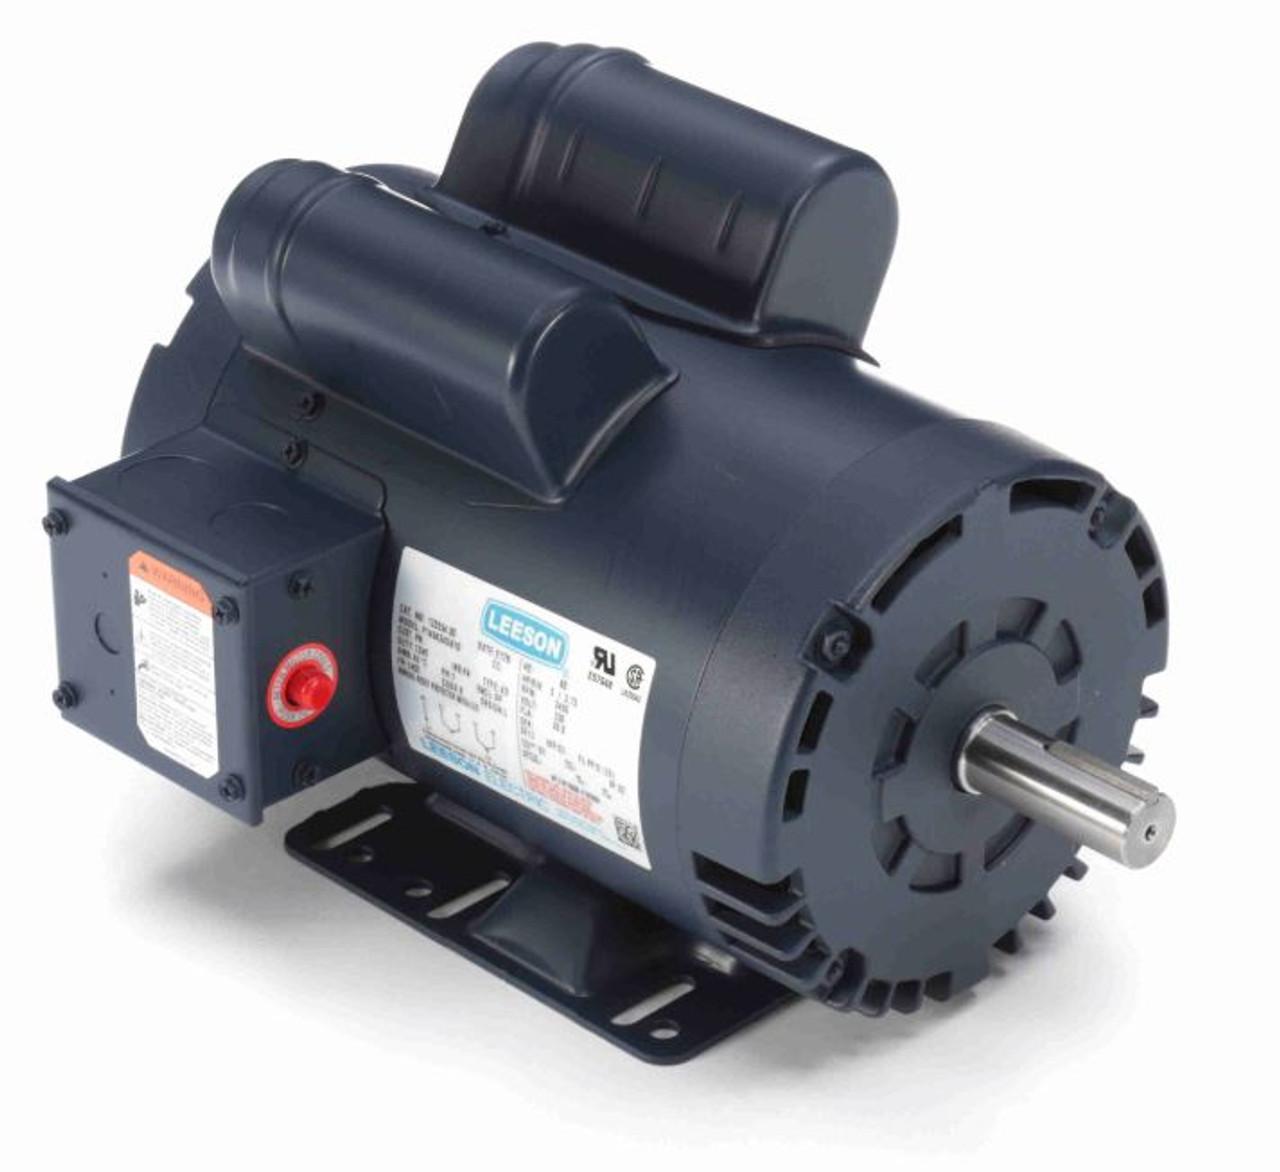 5 hp 3450 rpm 145t 230v air compressor motor leeson 120554Leeson 5 Hp Compressor Motor Wiring #16